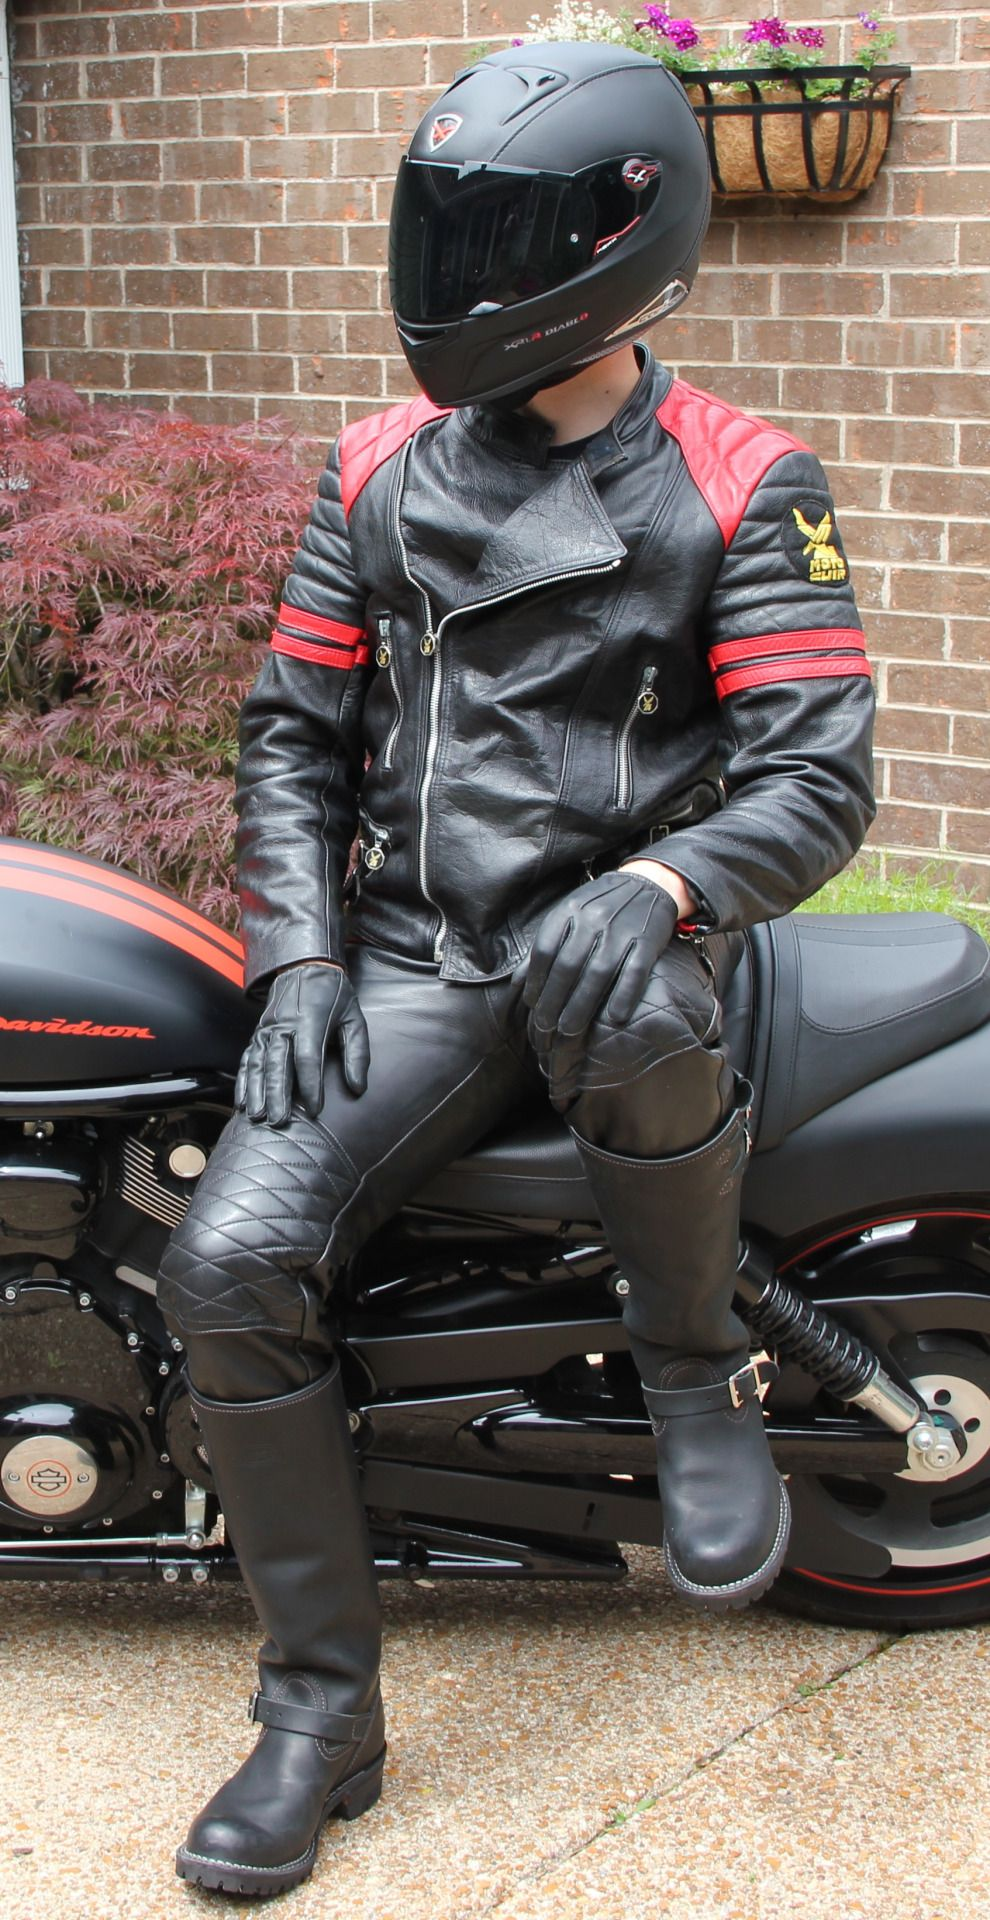 Biker in leather fetish